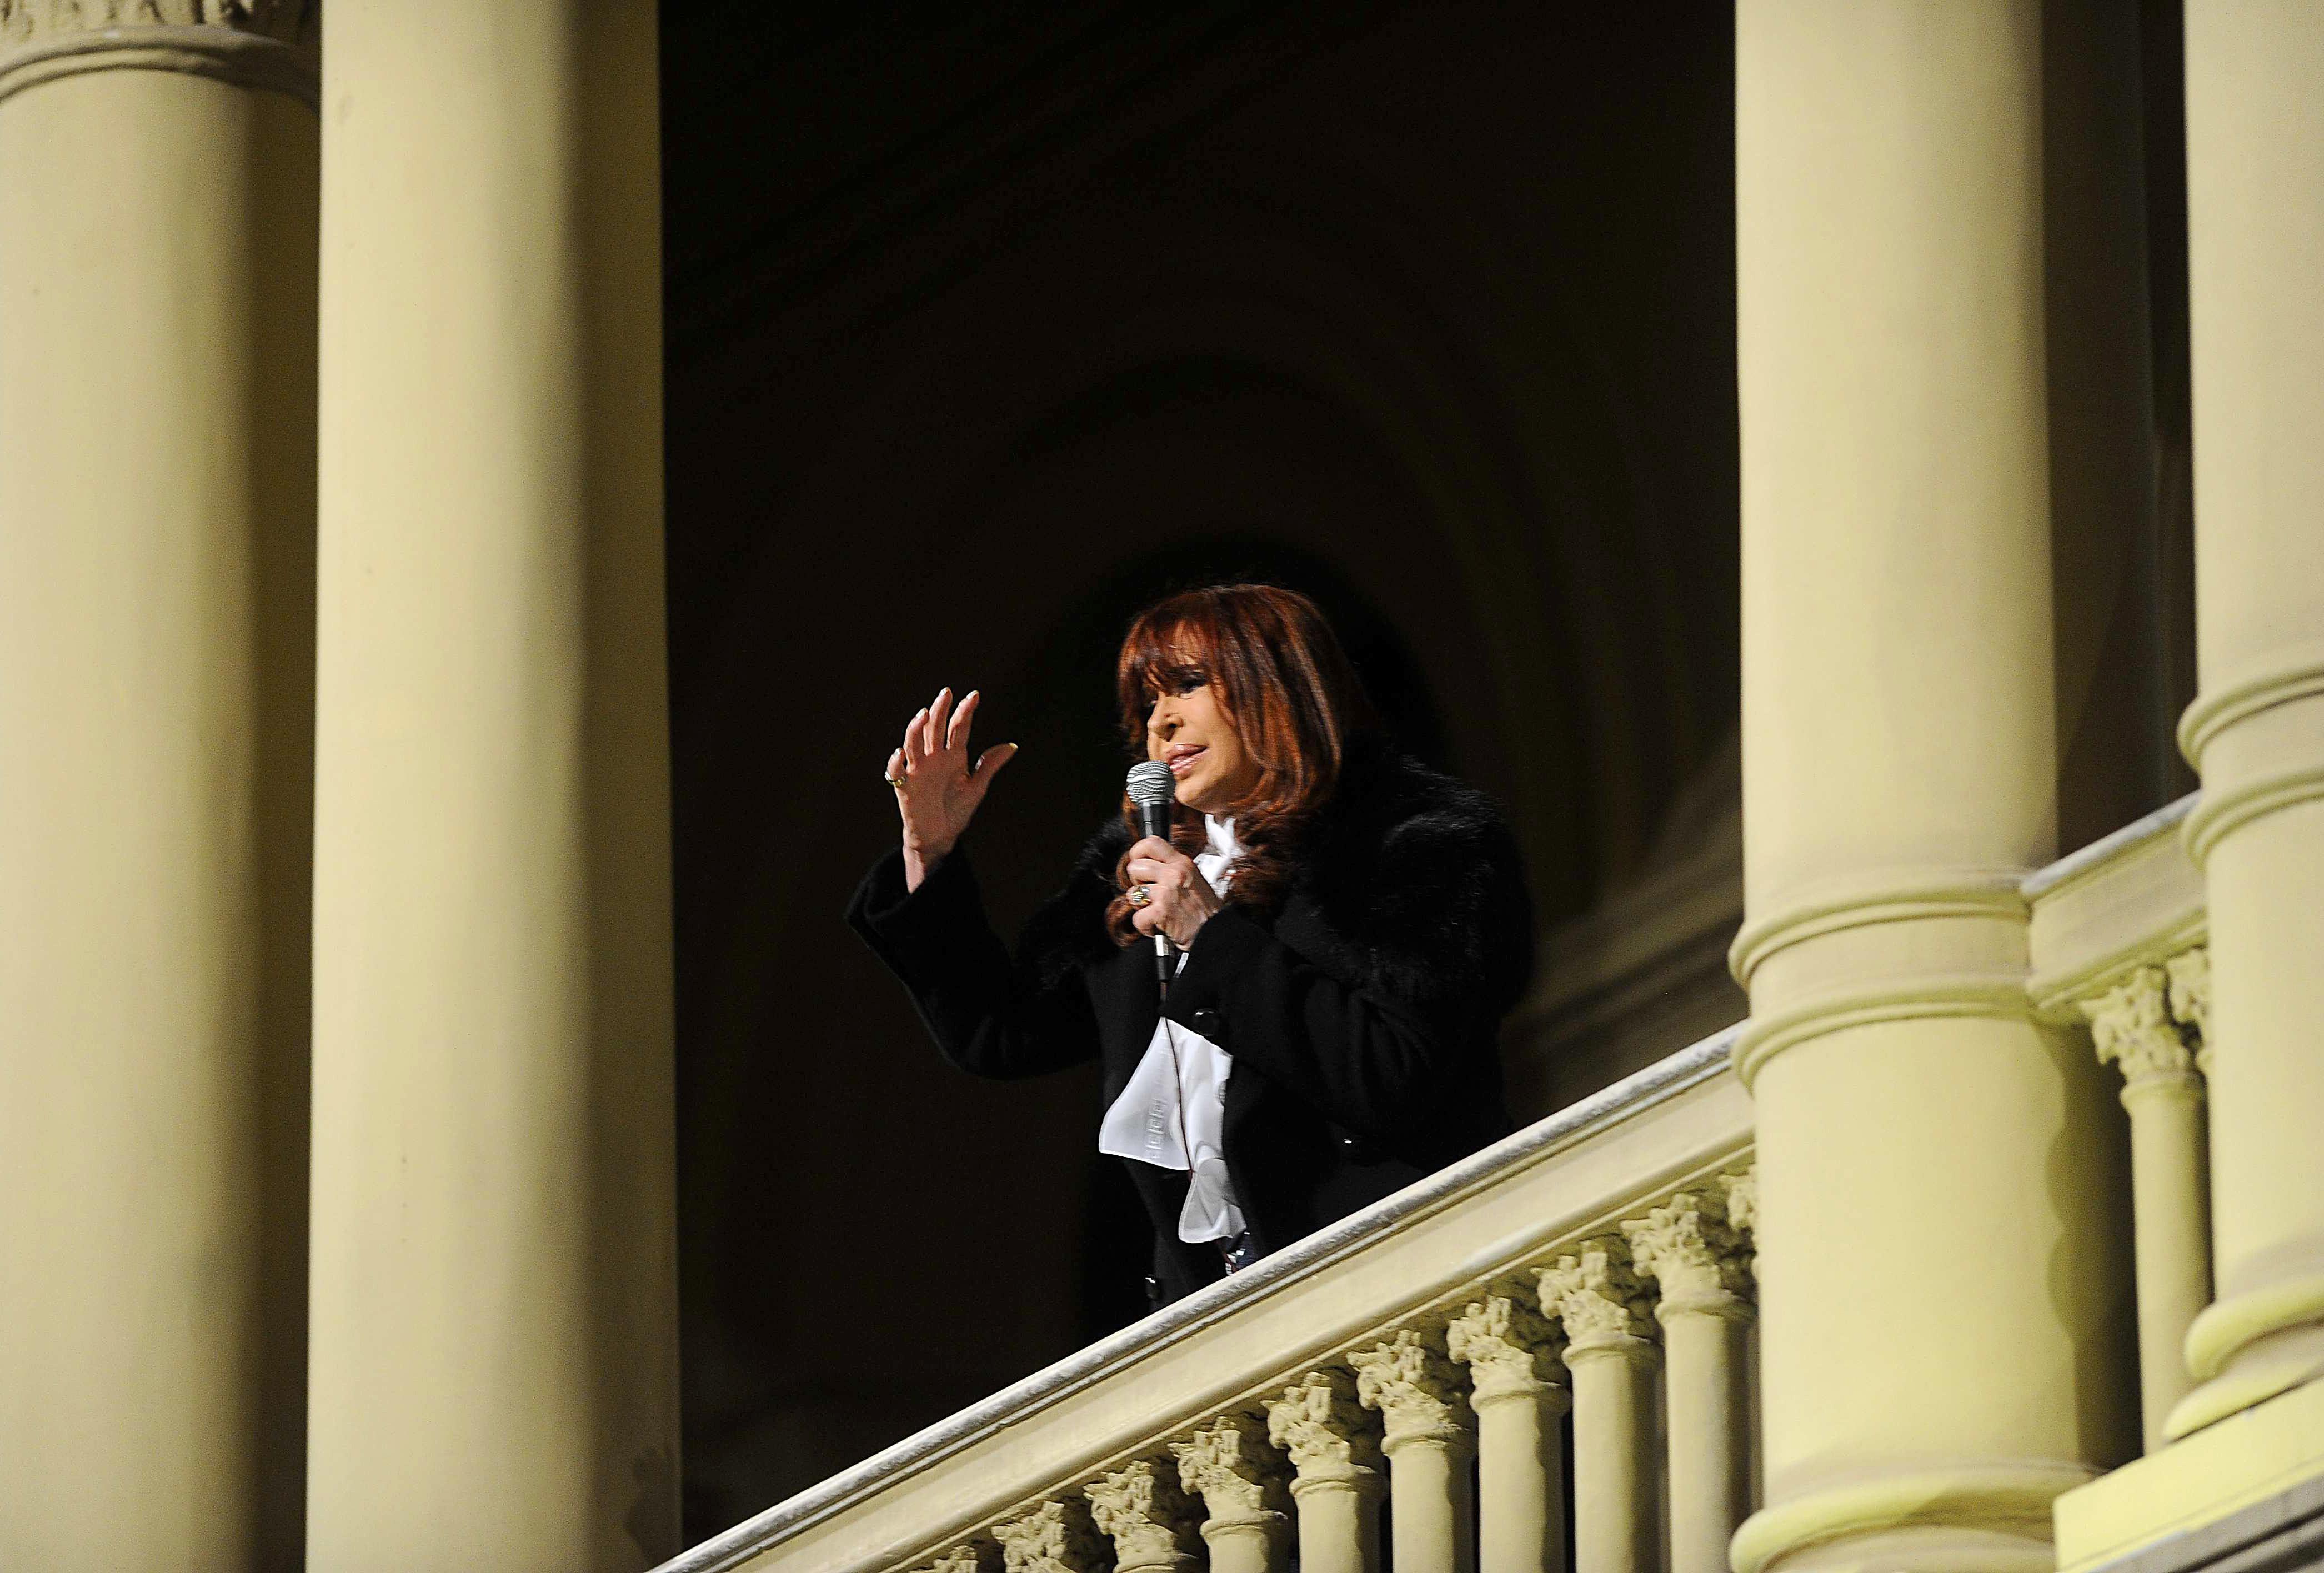 02-07-2015_buenos_aires_la_presidenta_cristina (4)